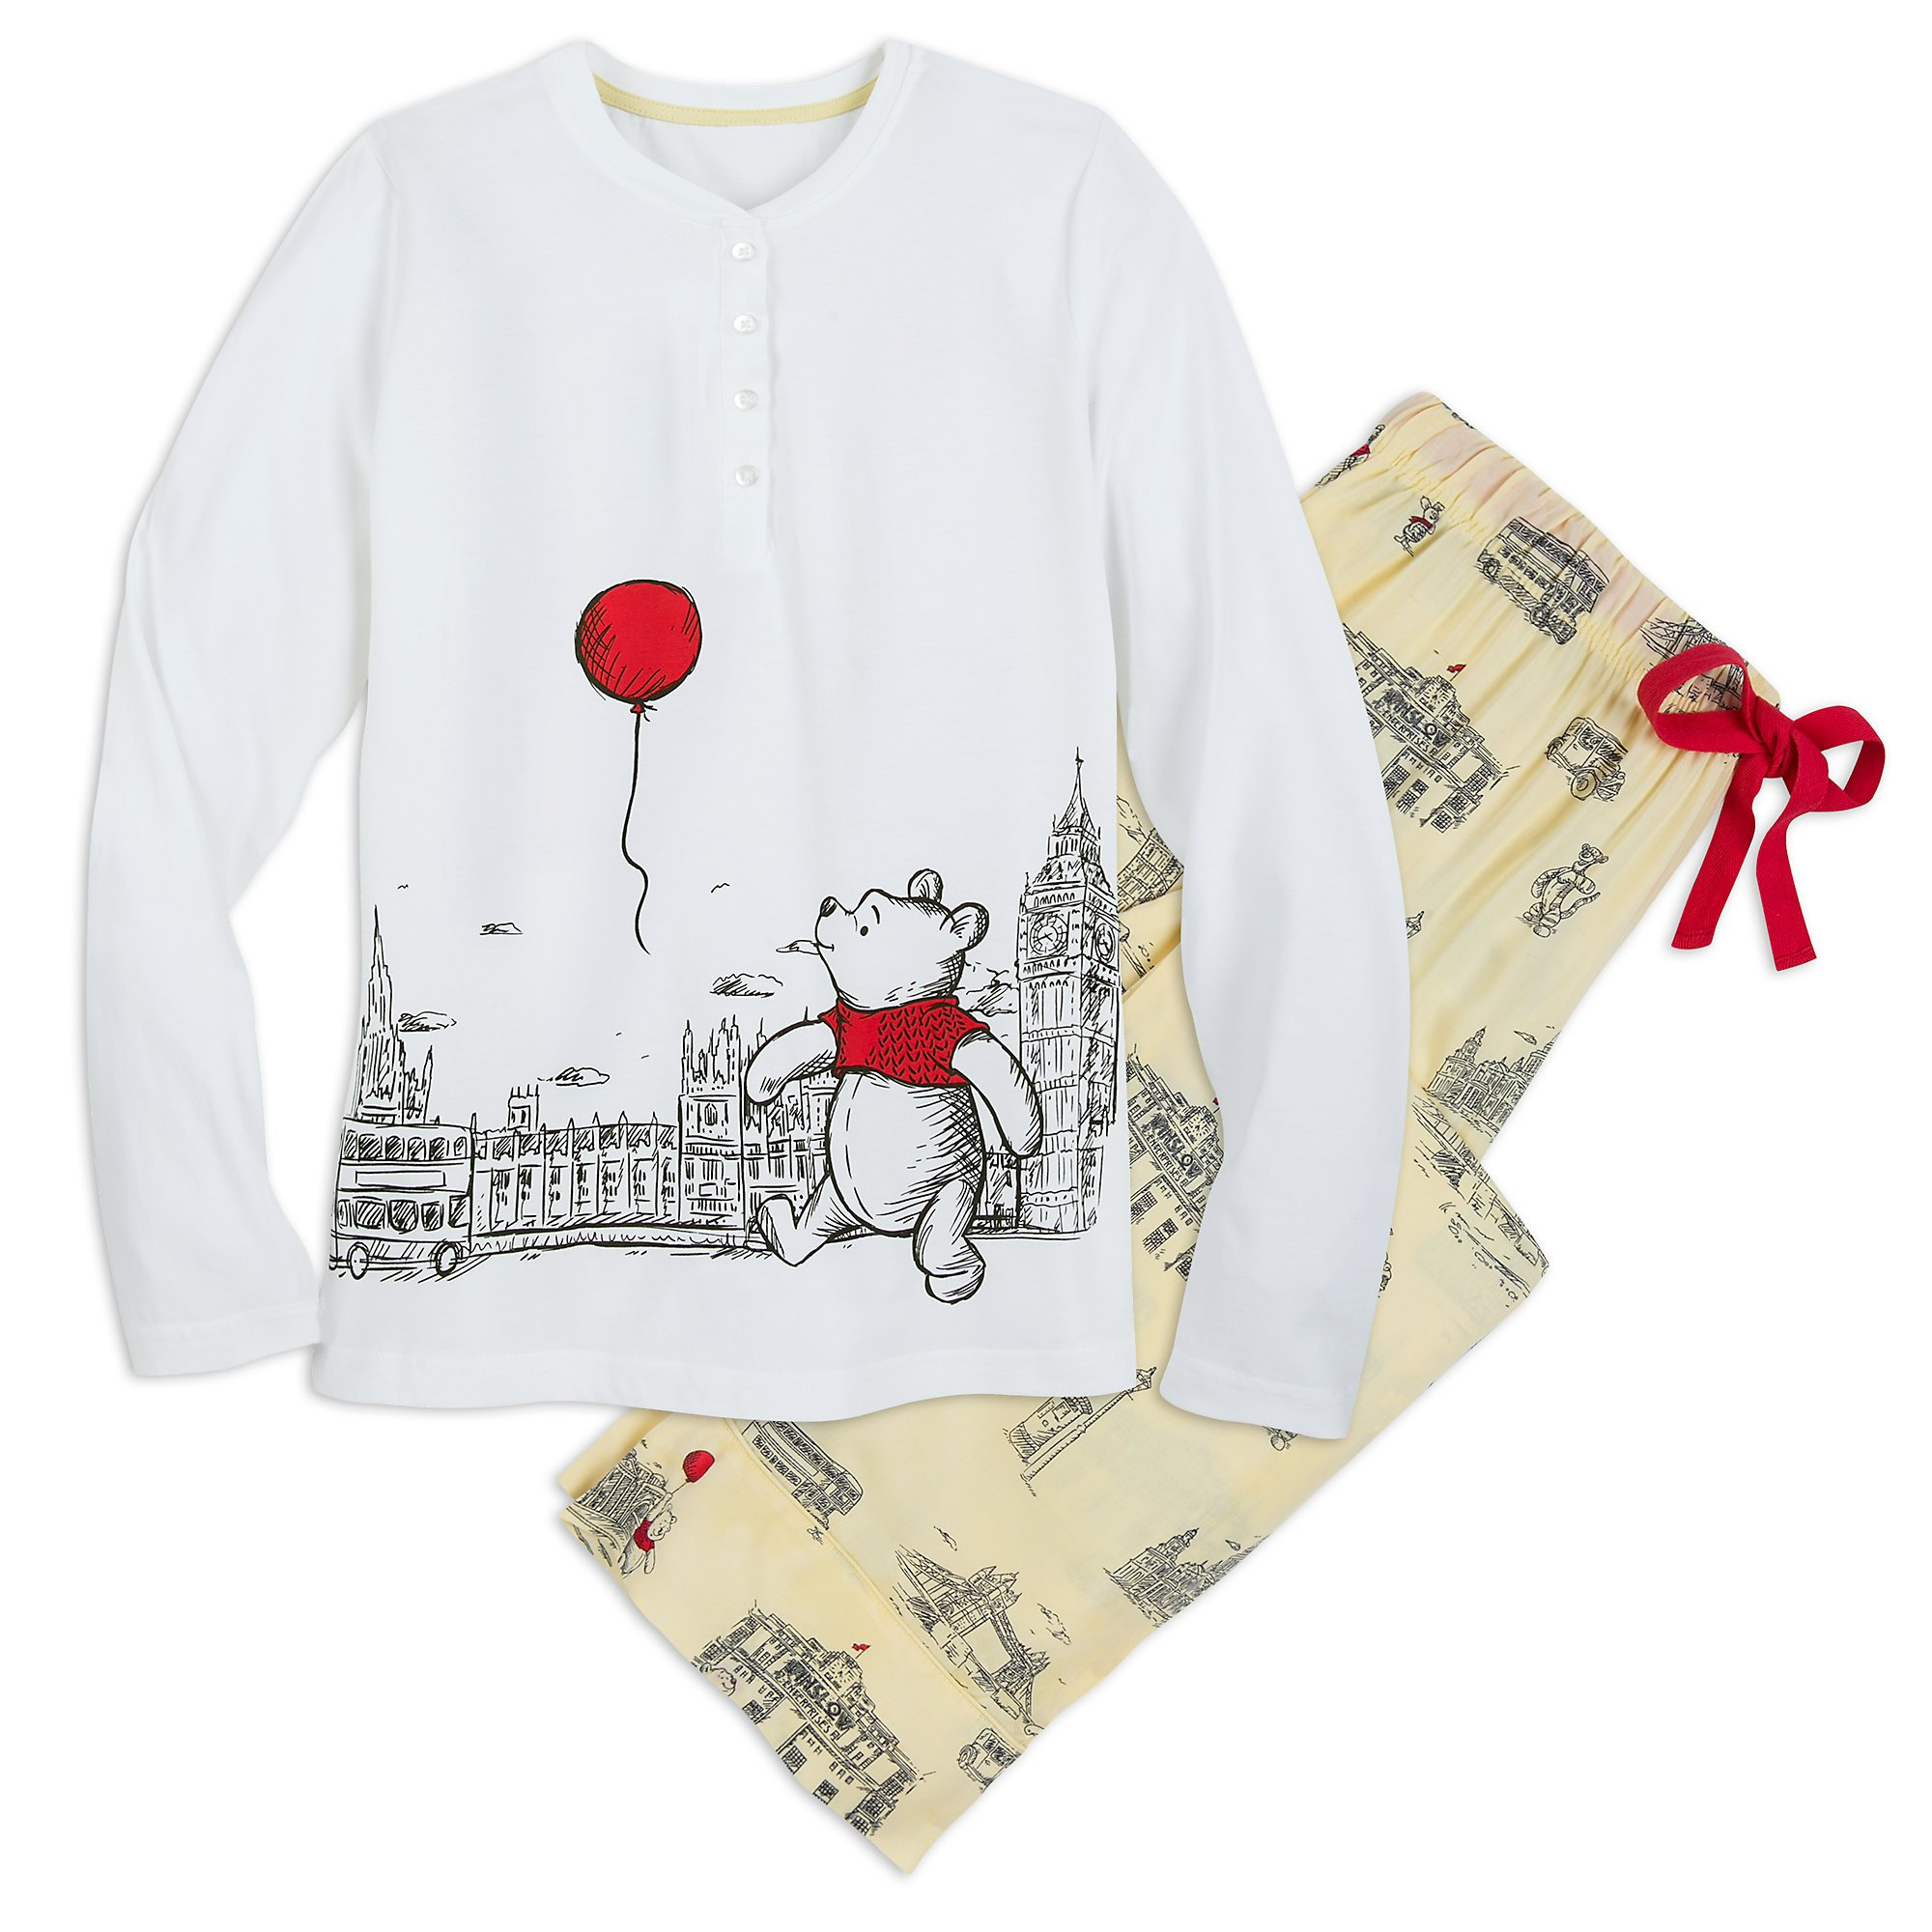 Disney Winnie The Pooh PJ Set for Women - Christopher Robin Ladies S Multi